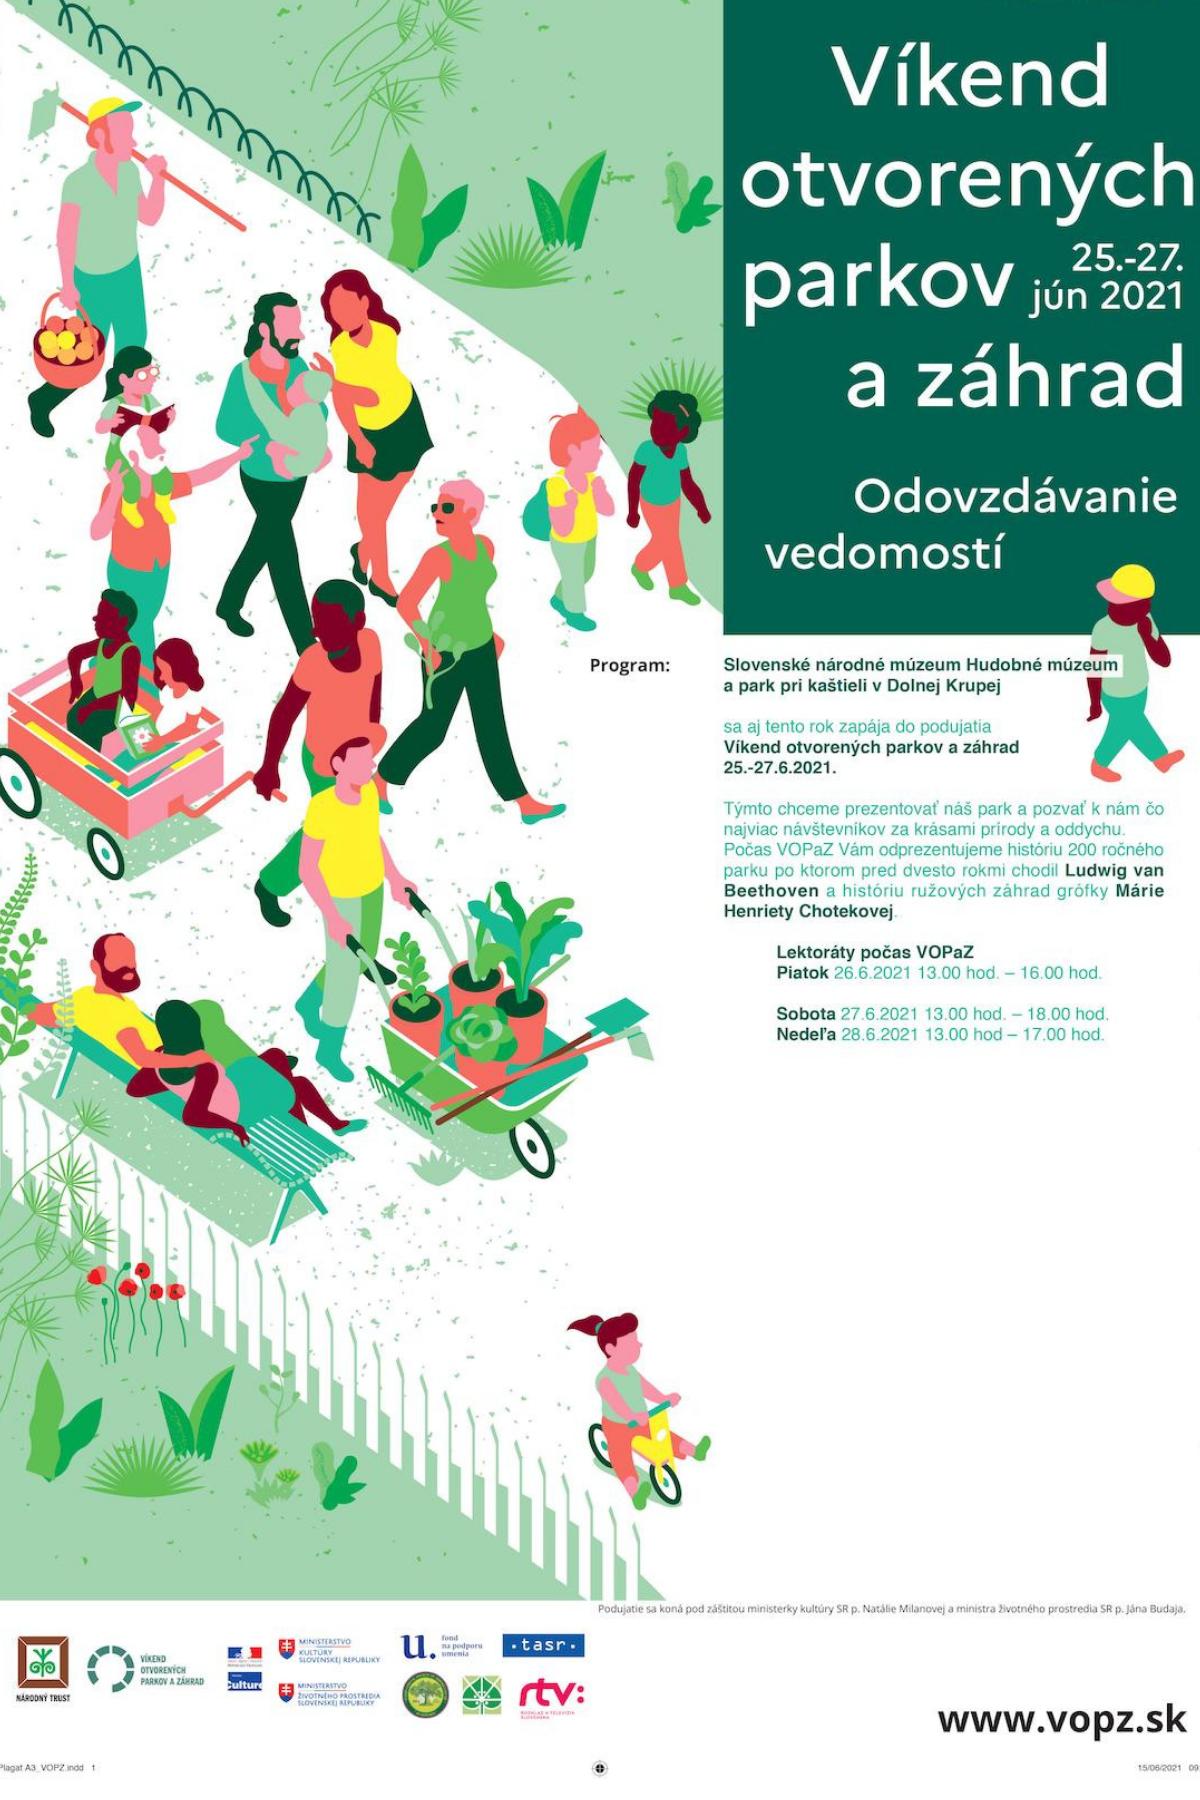 vikend-otvorenych-parkov-2021-kastiel-dolna-krupa.png